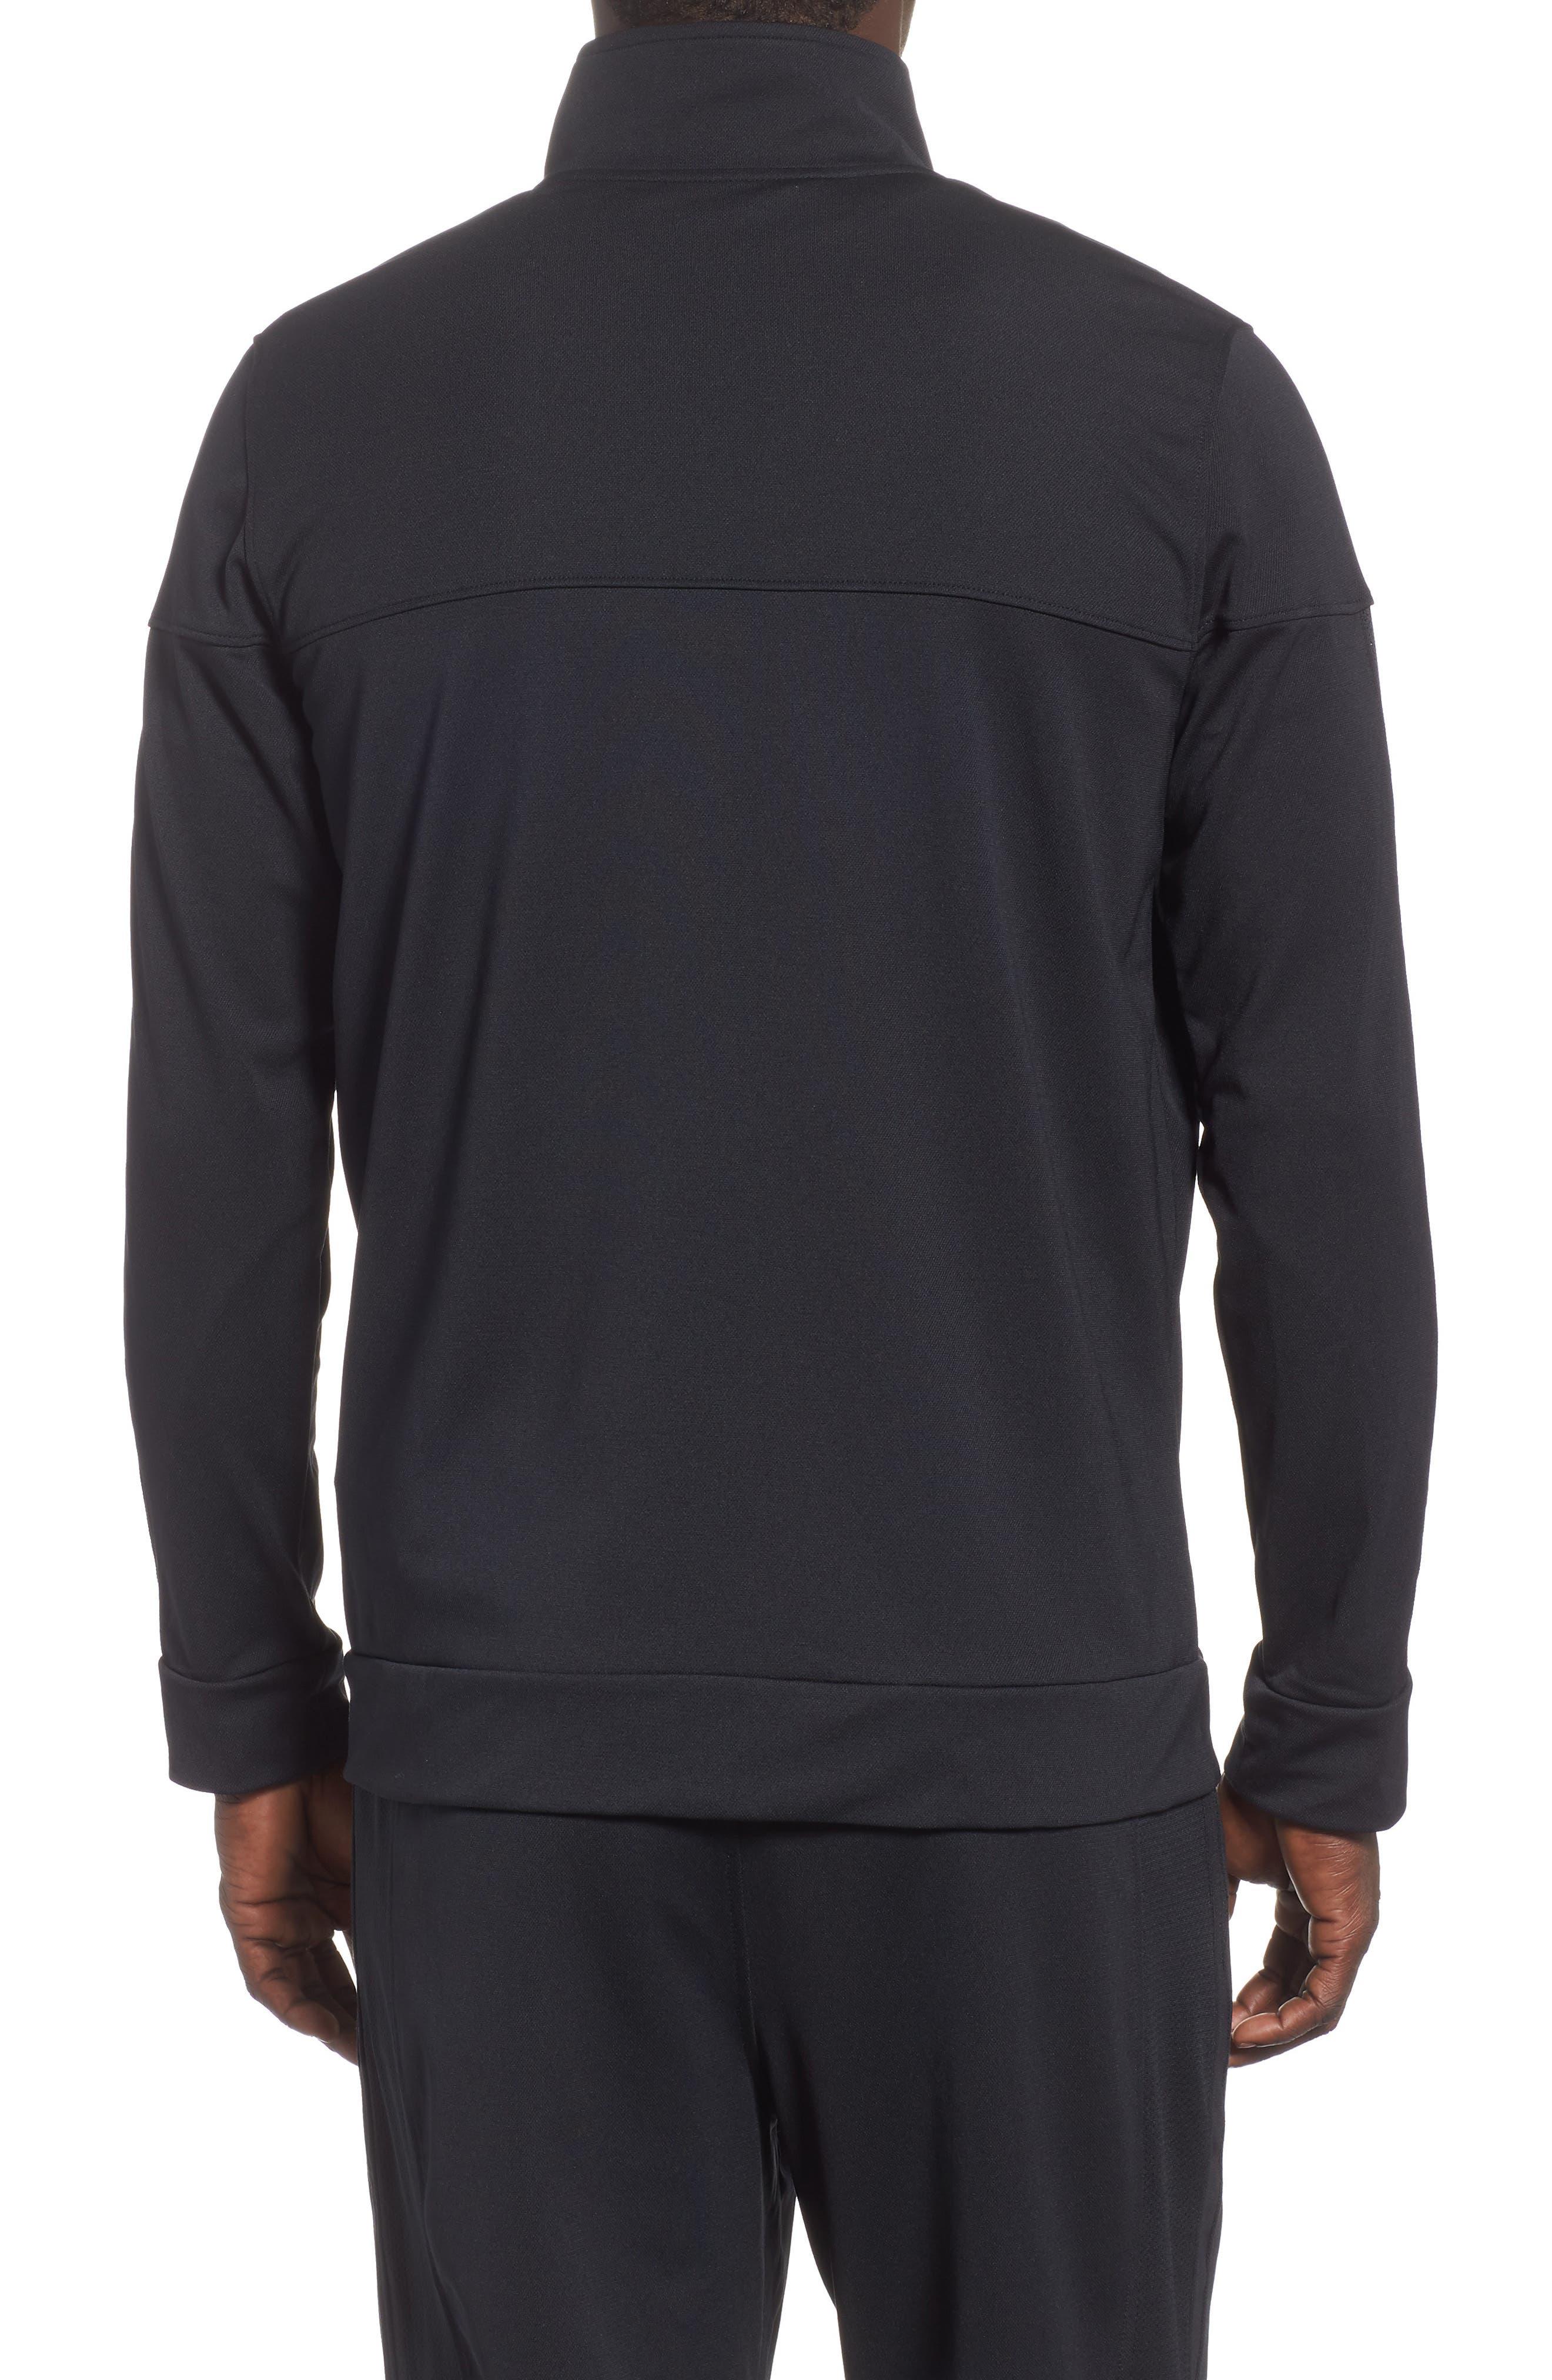 Sportstyle Piqué Track Jacket,                             Alternate thumbnail 2, color,                             BLACK / / BLACK